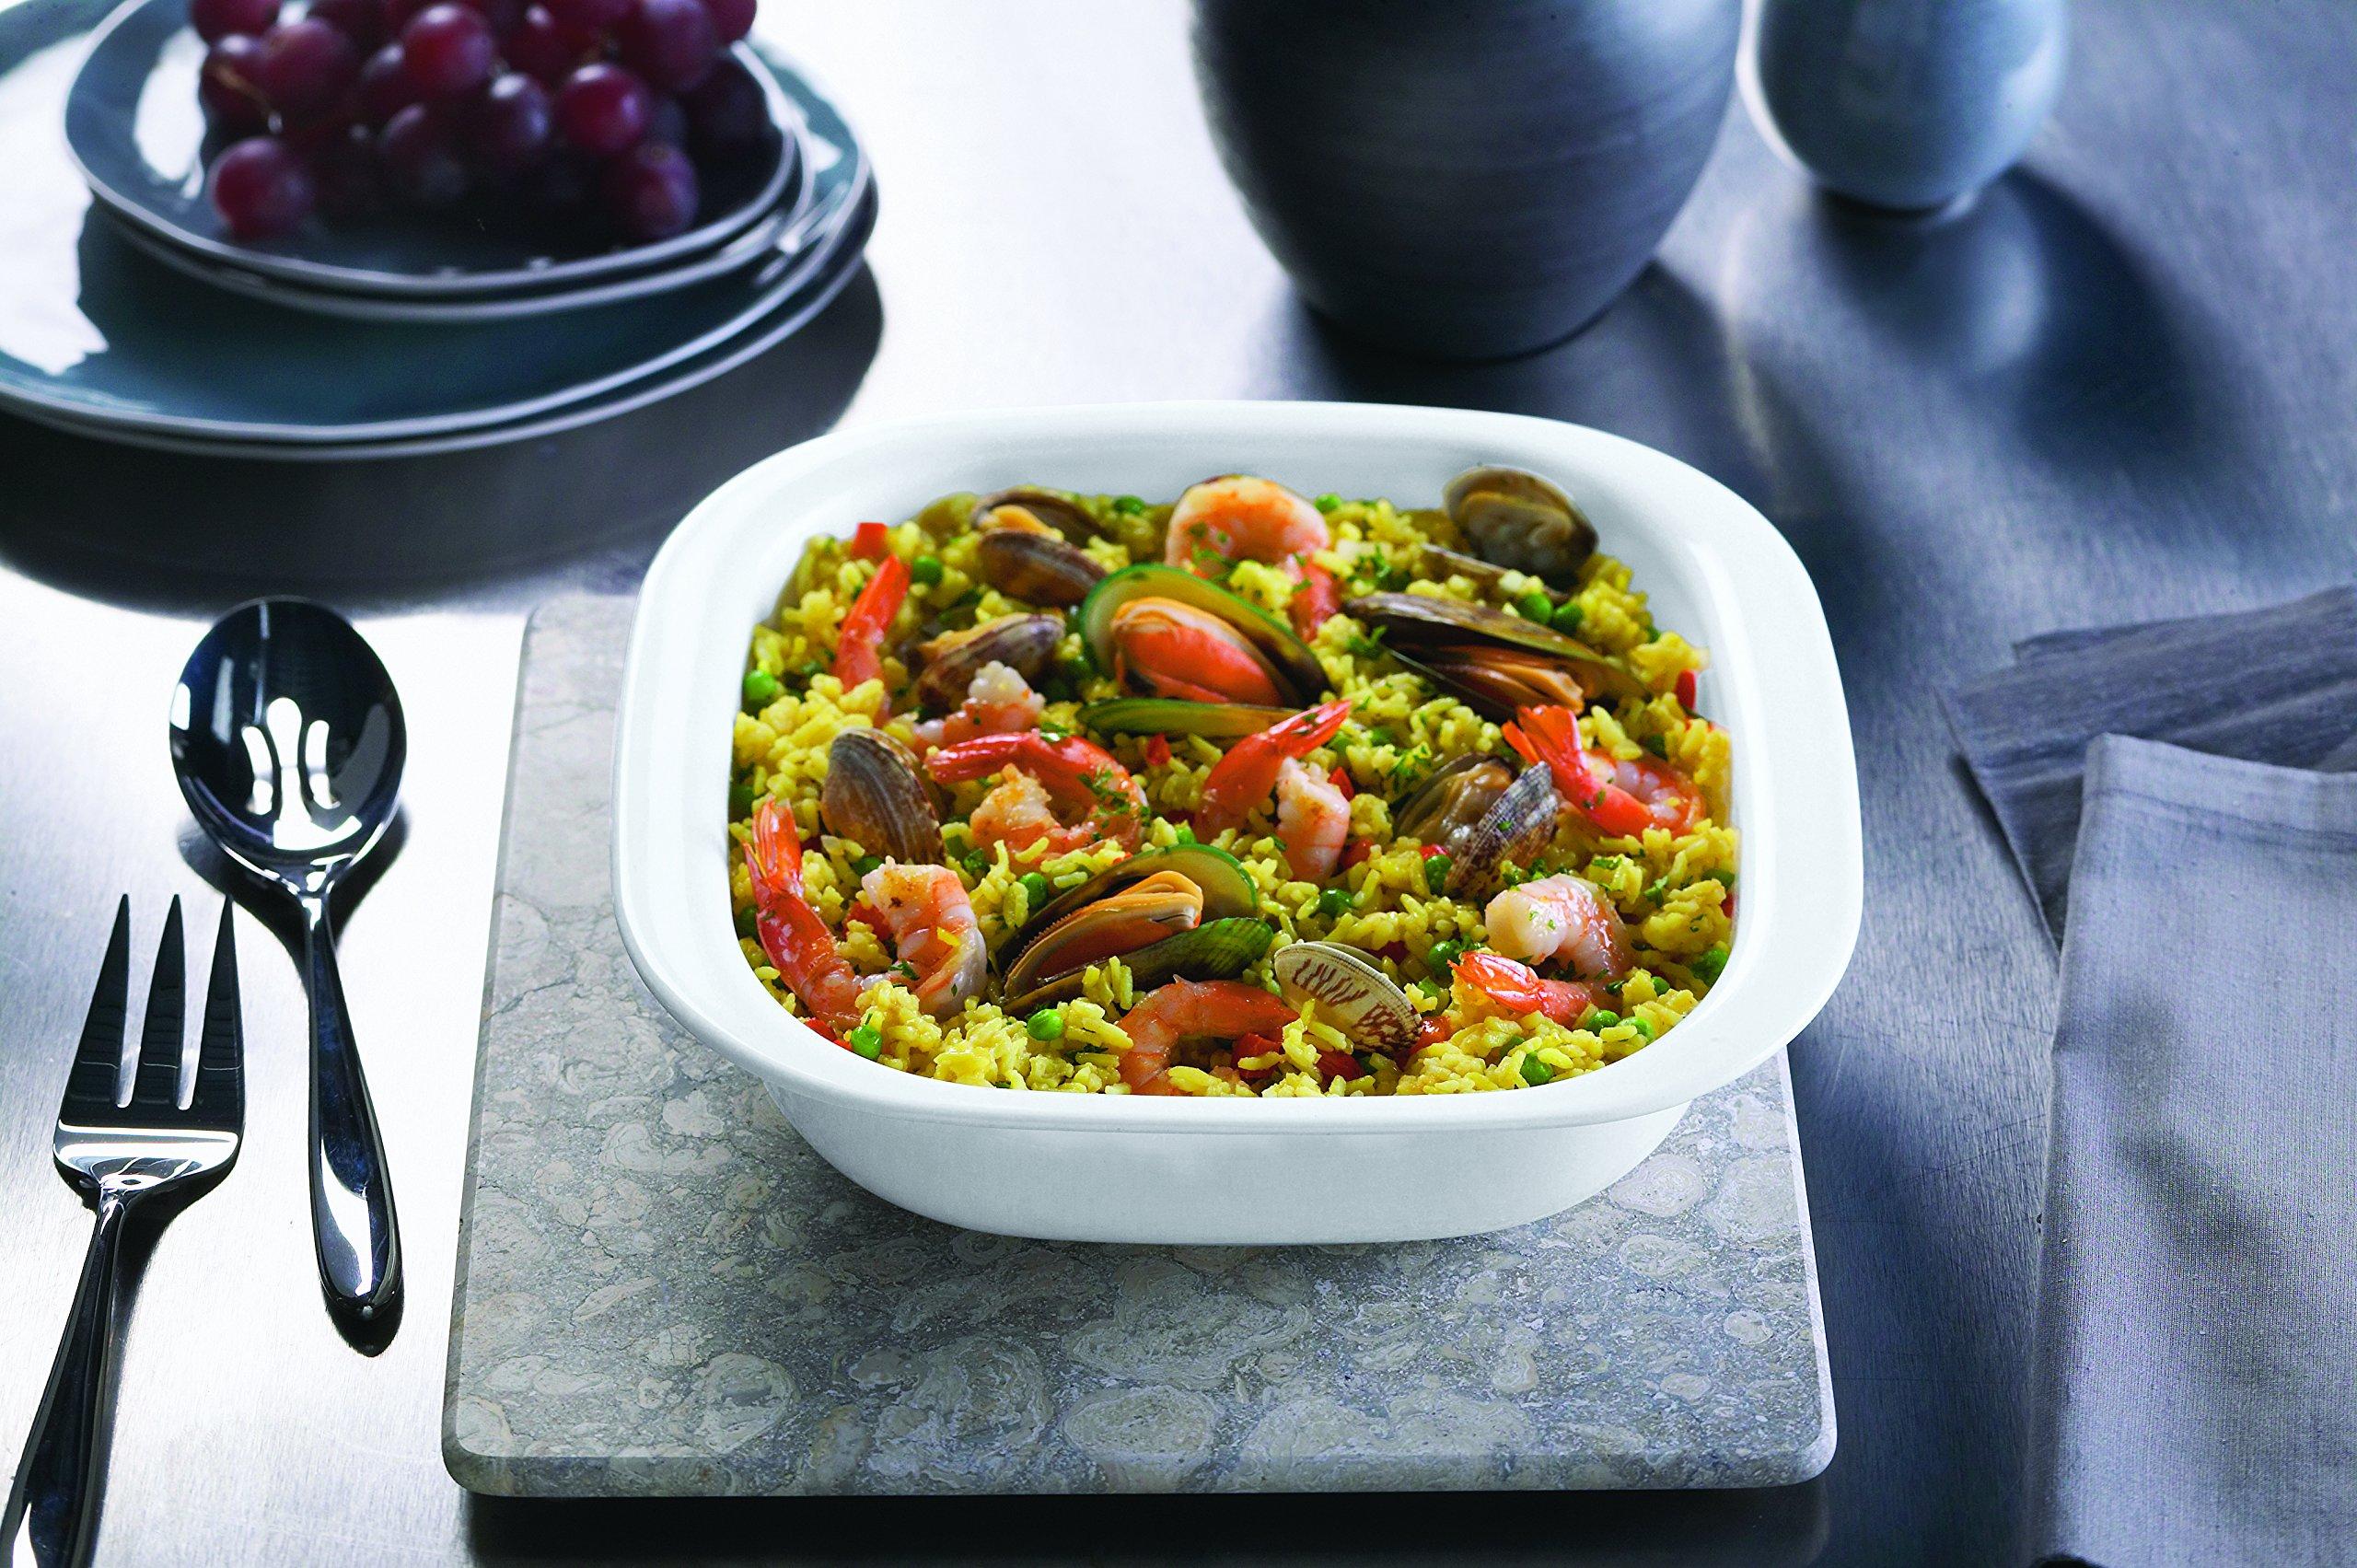 CorningWare SimplyLite 3-Quart Oblong Baking Dish with Plastic Lid by CorningWare (Image #3)